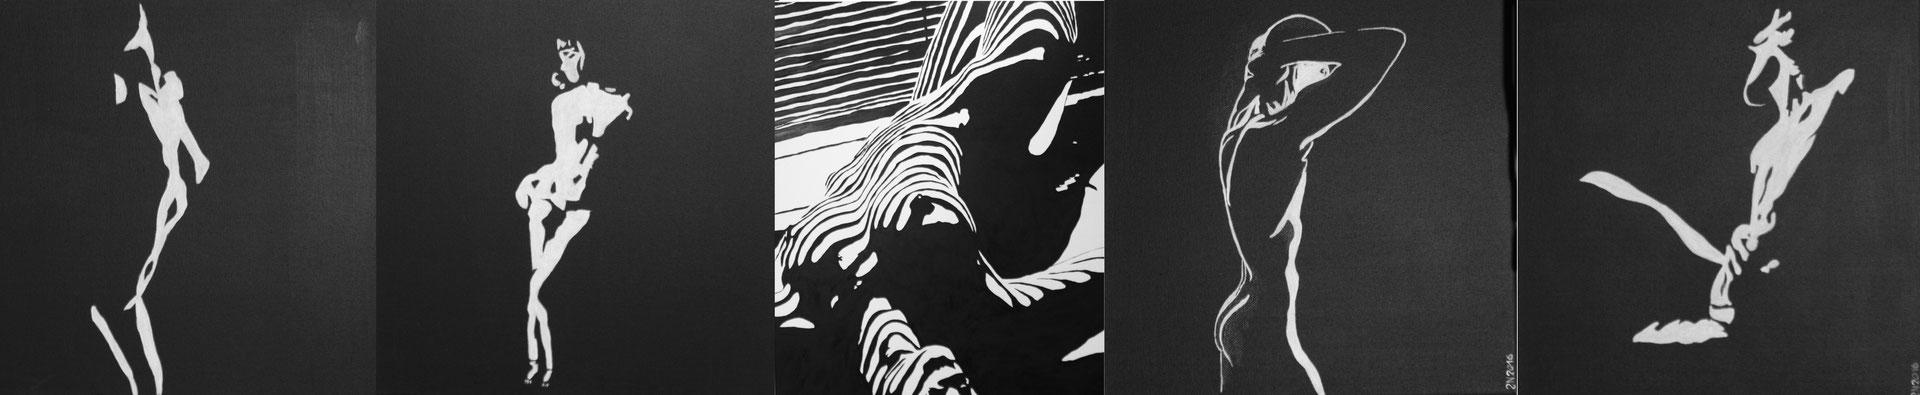 ZEBRAWOMAN  Acrylpainting on canvas, ca. 100 x 120 cm